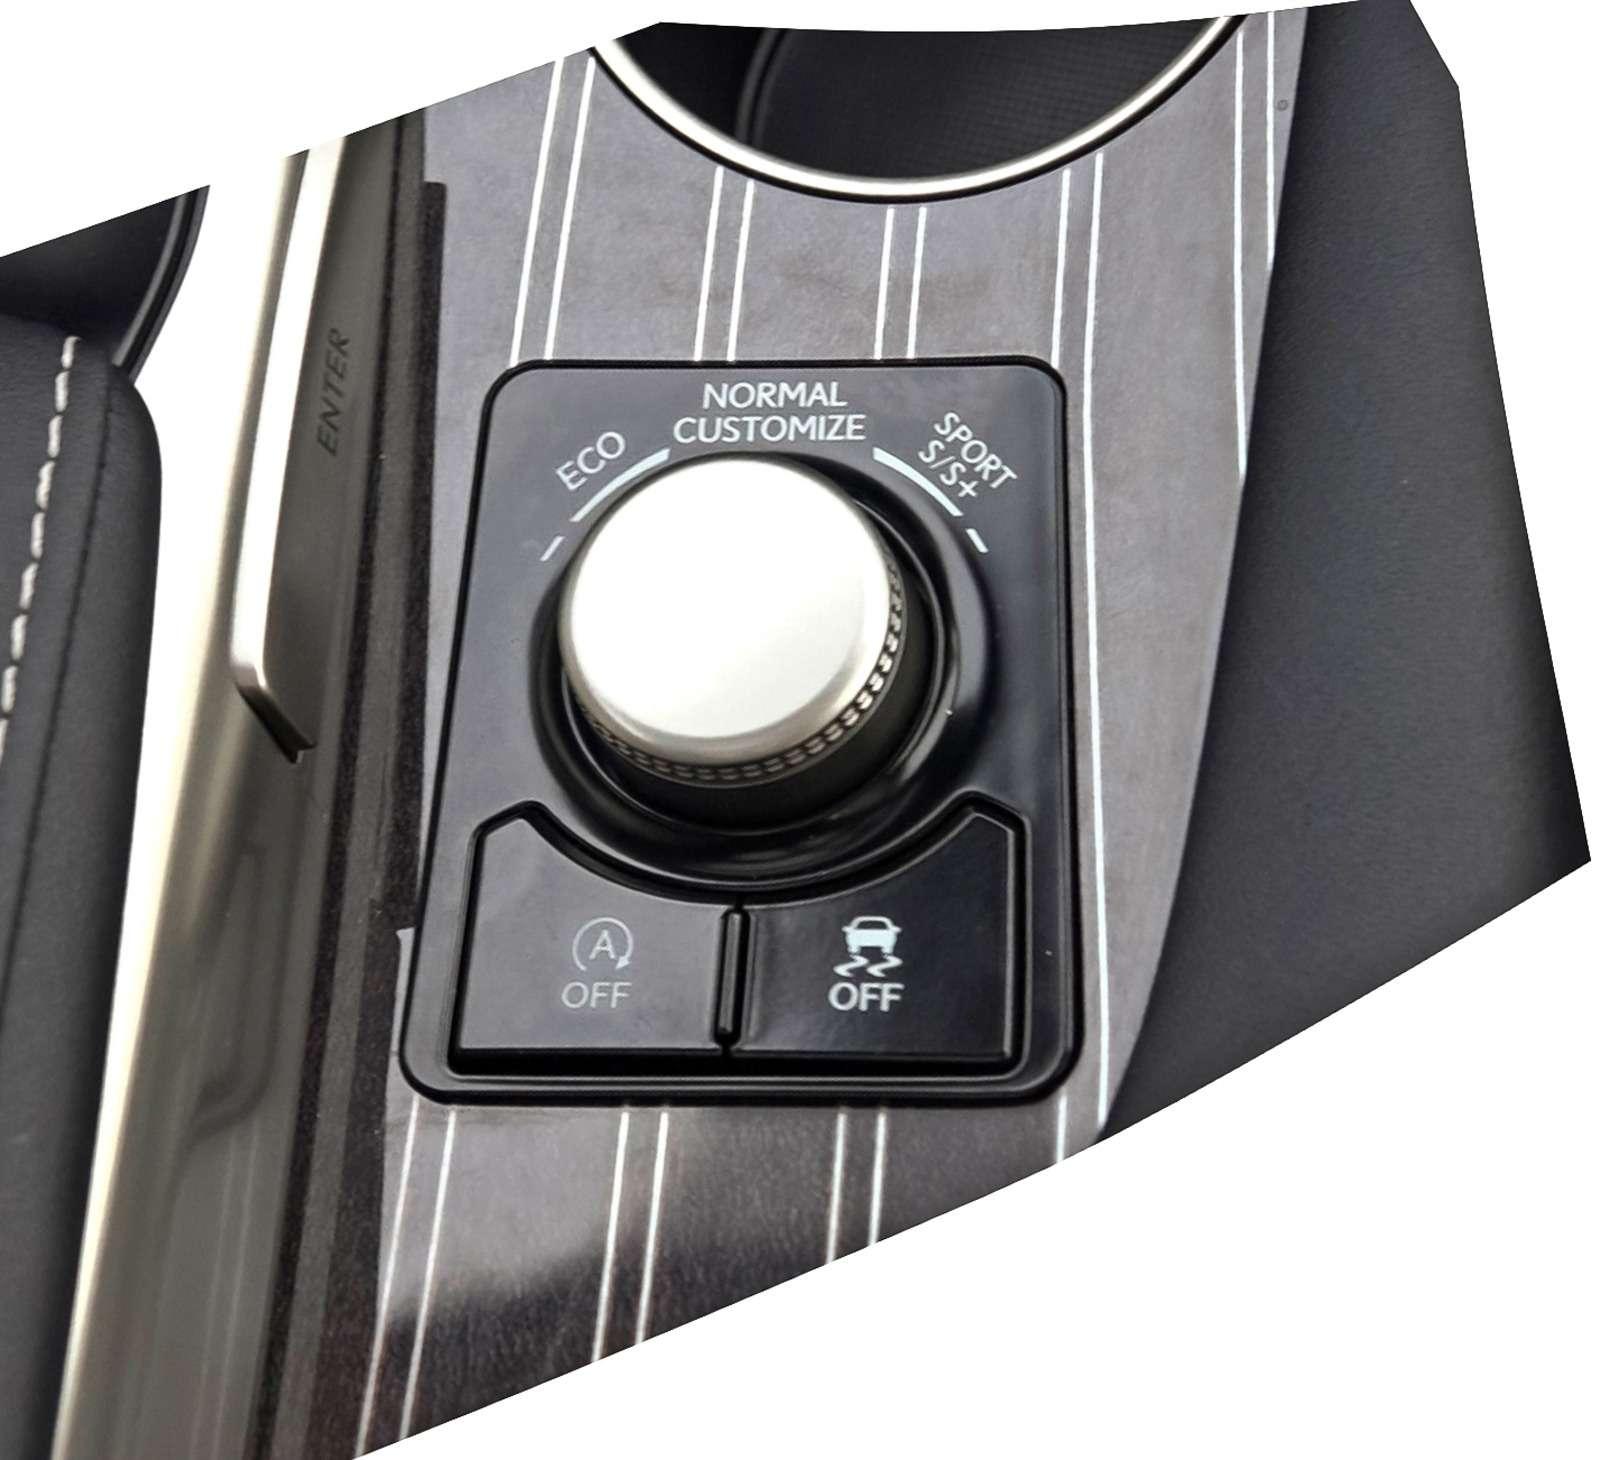 08-Lexus_zr-02_16